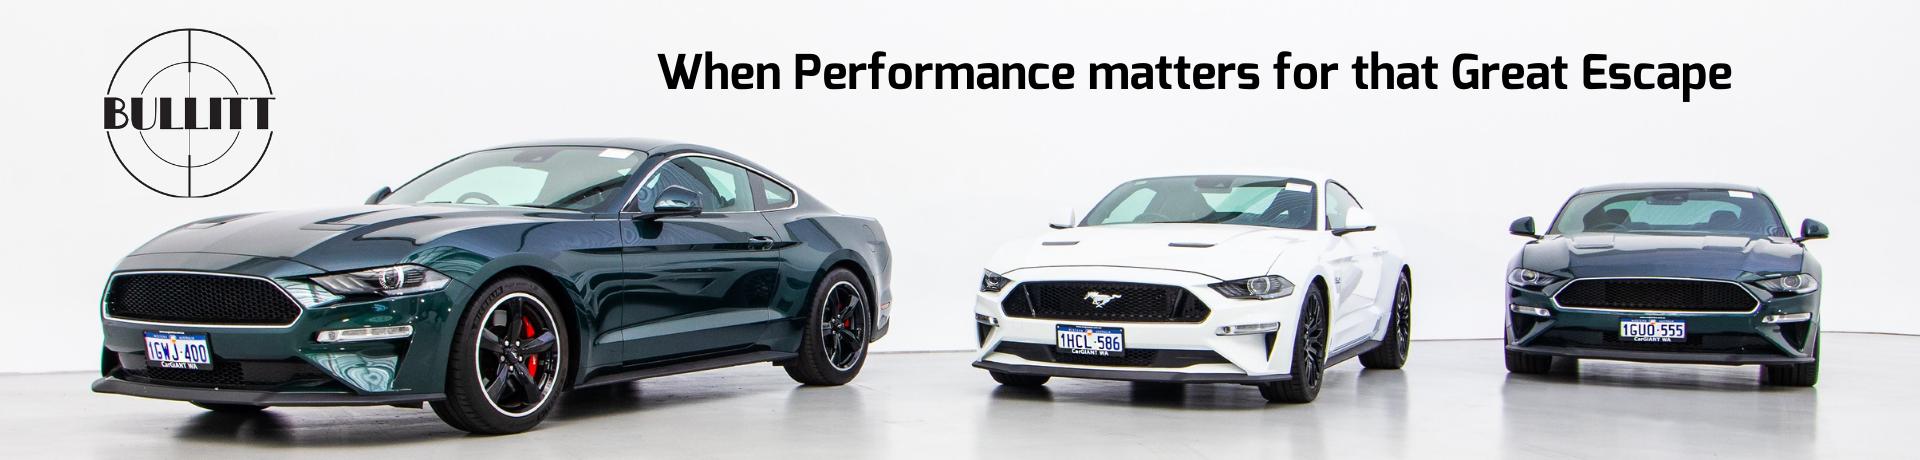 2019 Mustang-Bullitt Coupe